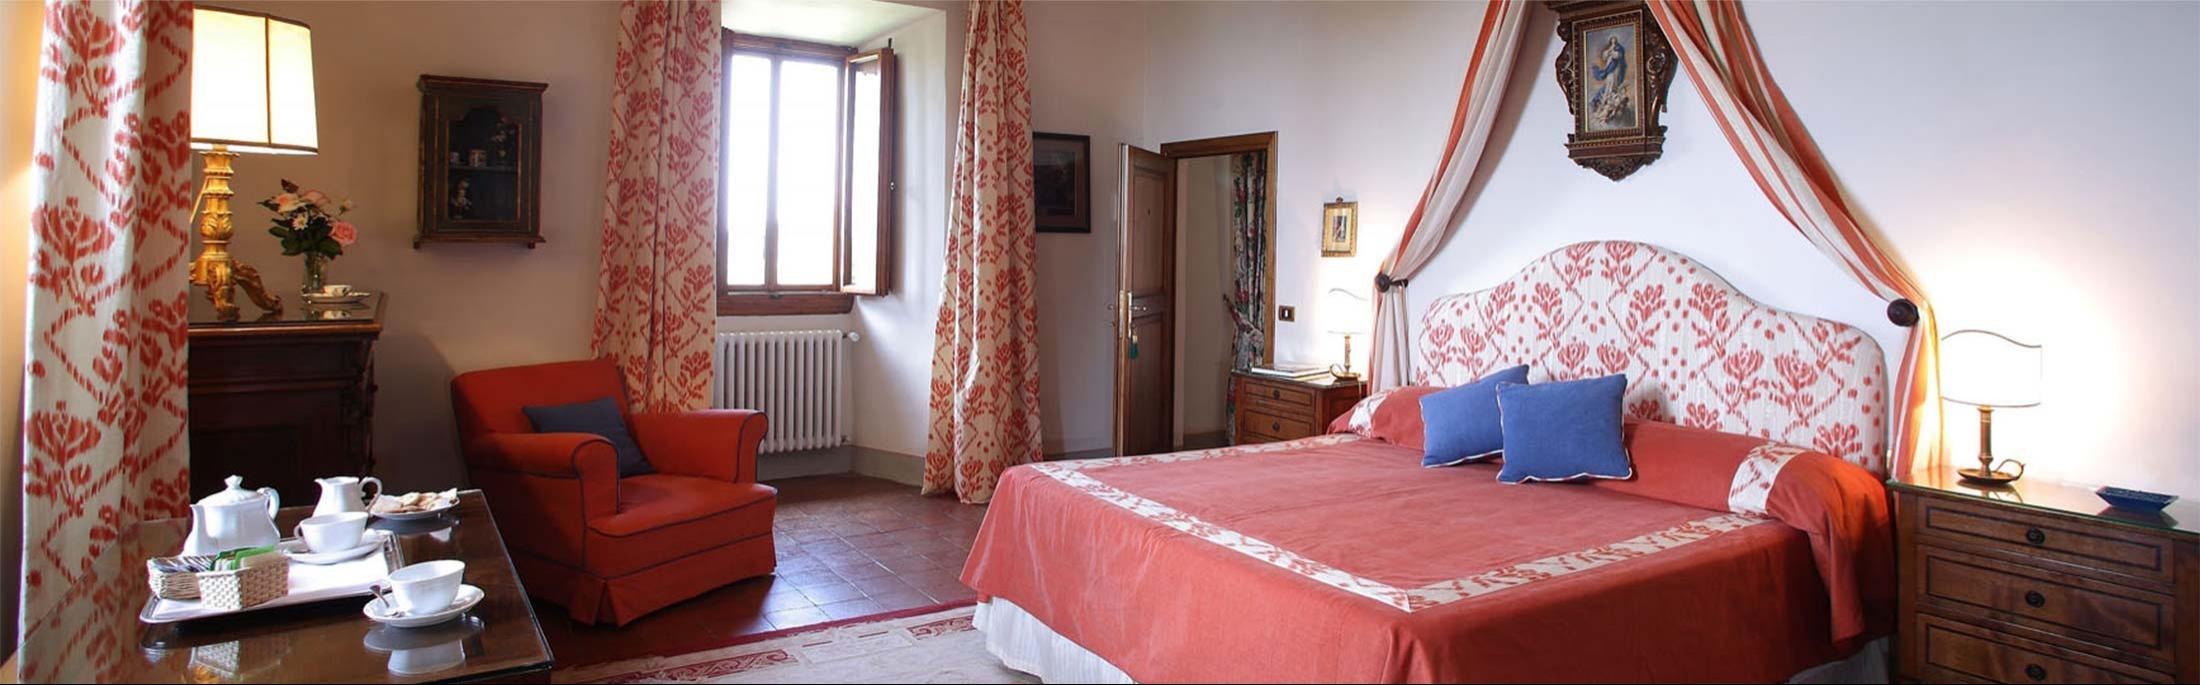 Villa Le Barone - Zimmer